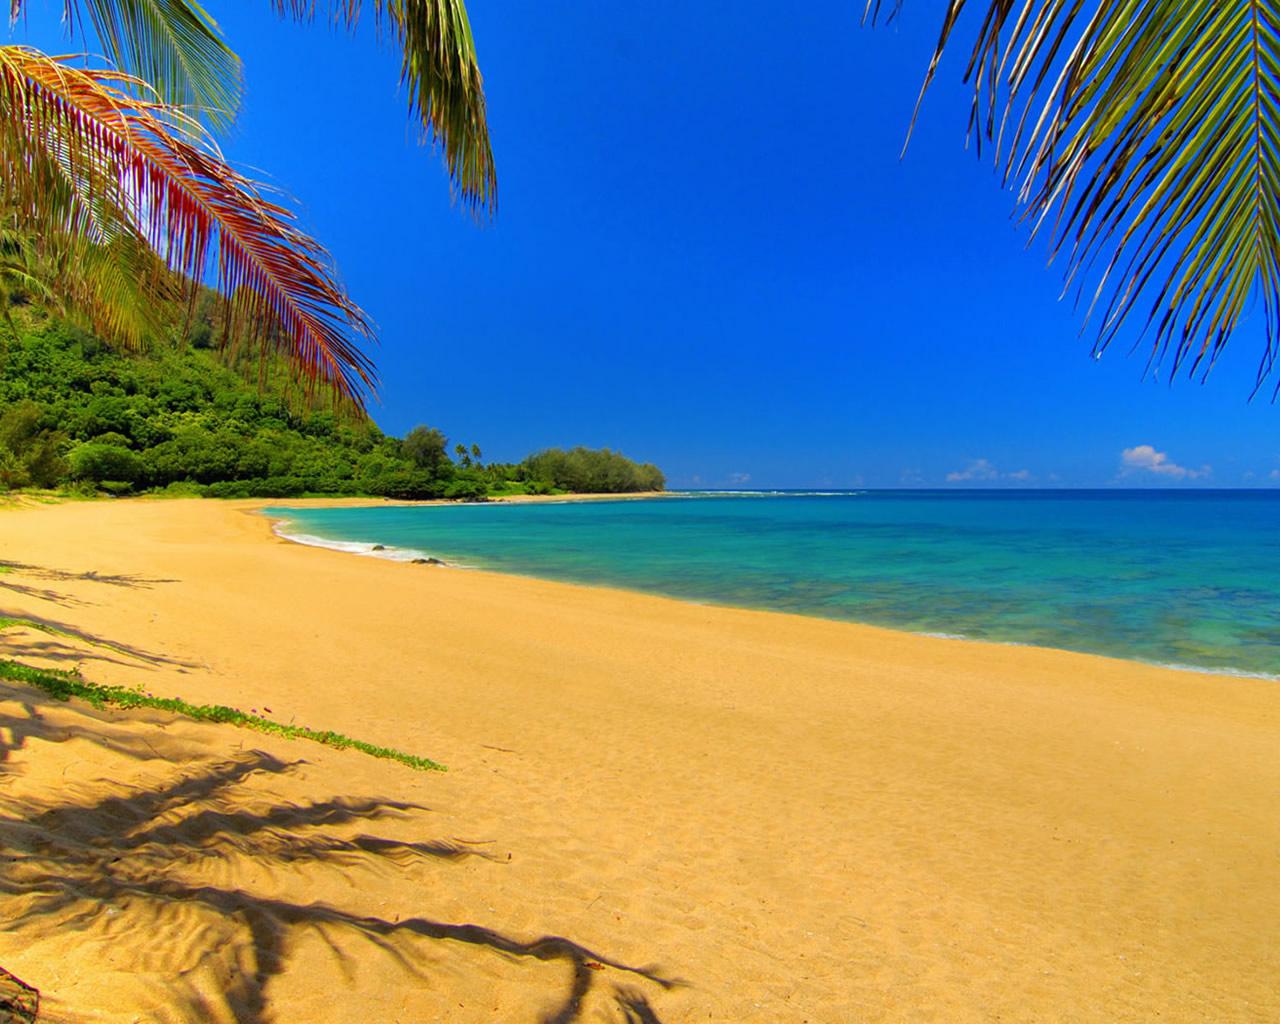 Summer Beach 1280x1024